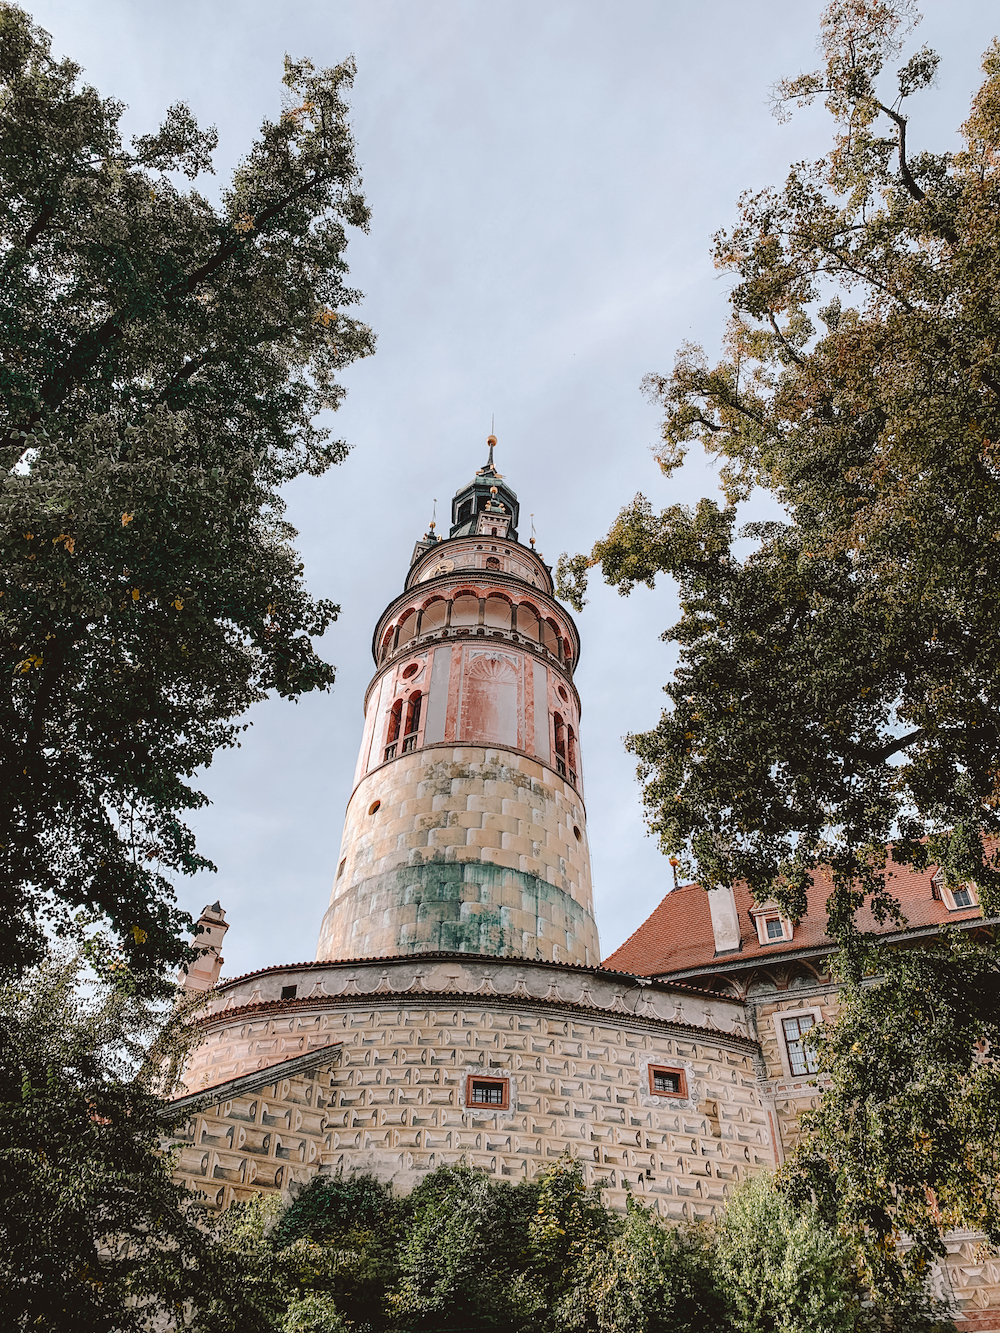 Toren van het kasteel van Cesky Krumlov